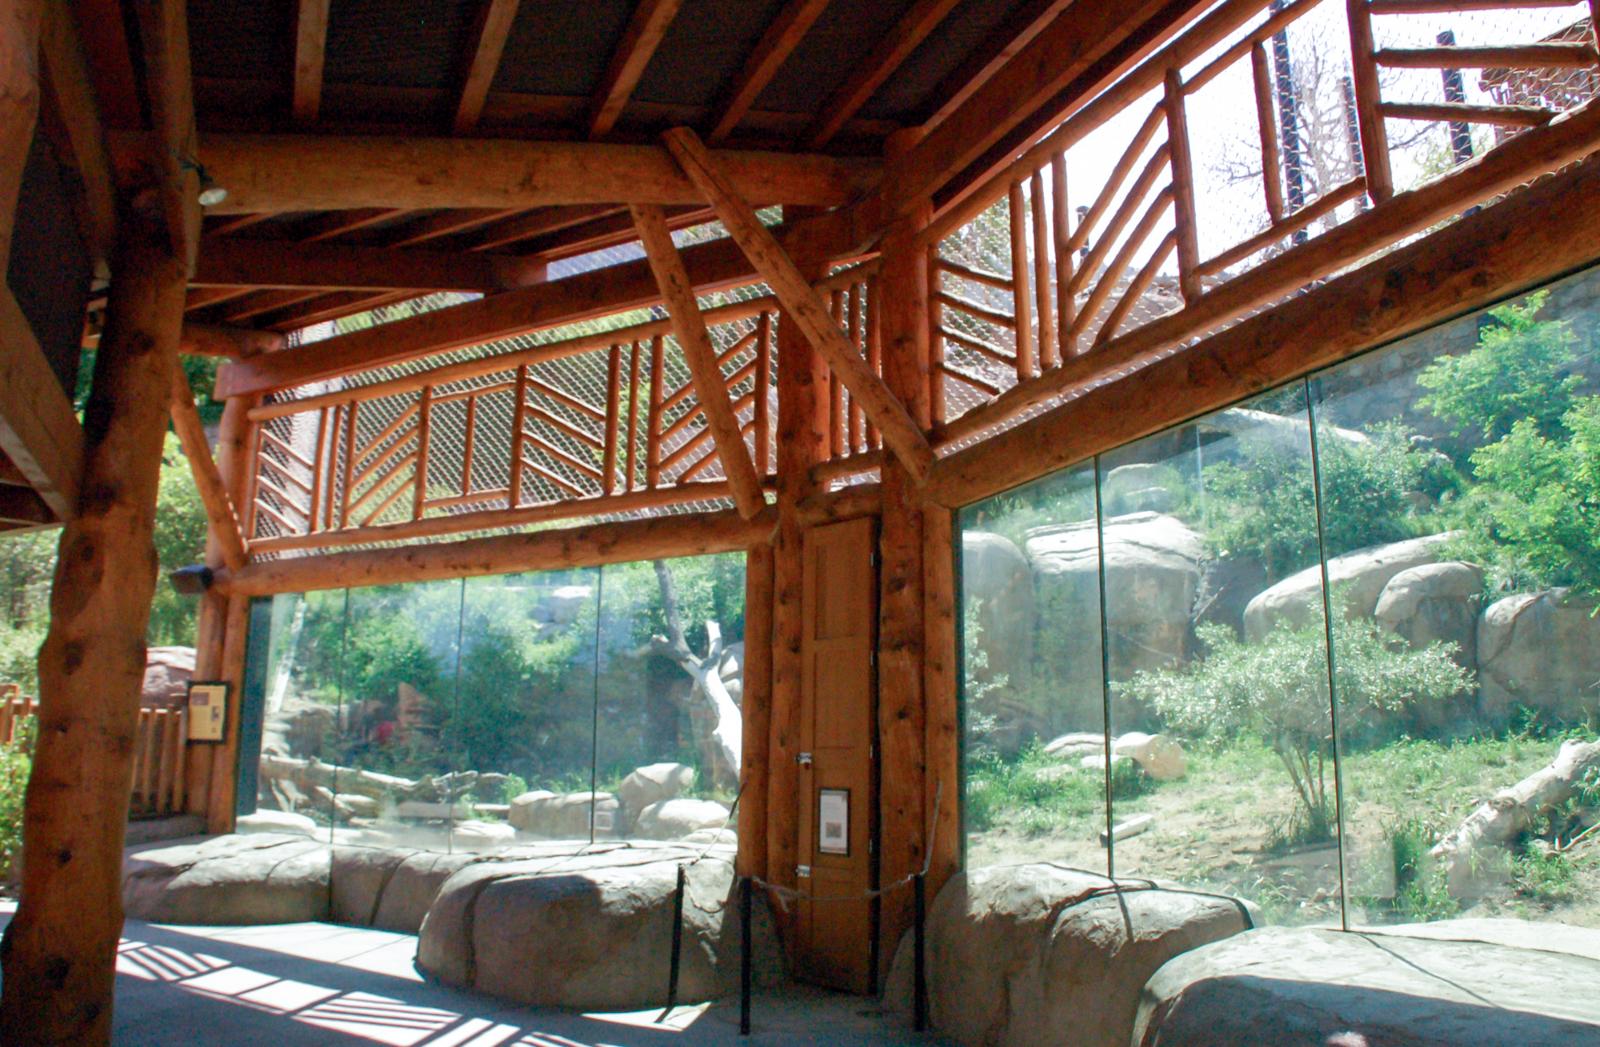 20160619-Lion viewing interior.jpg